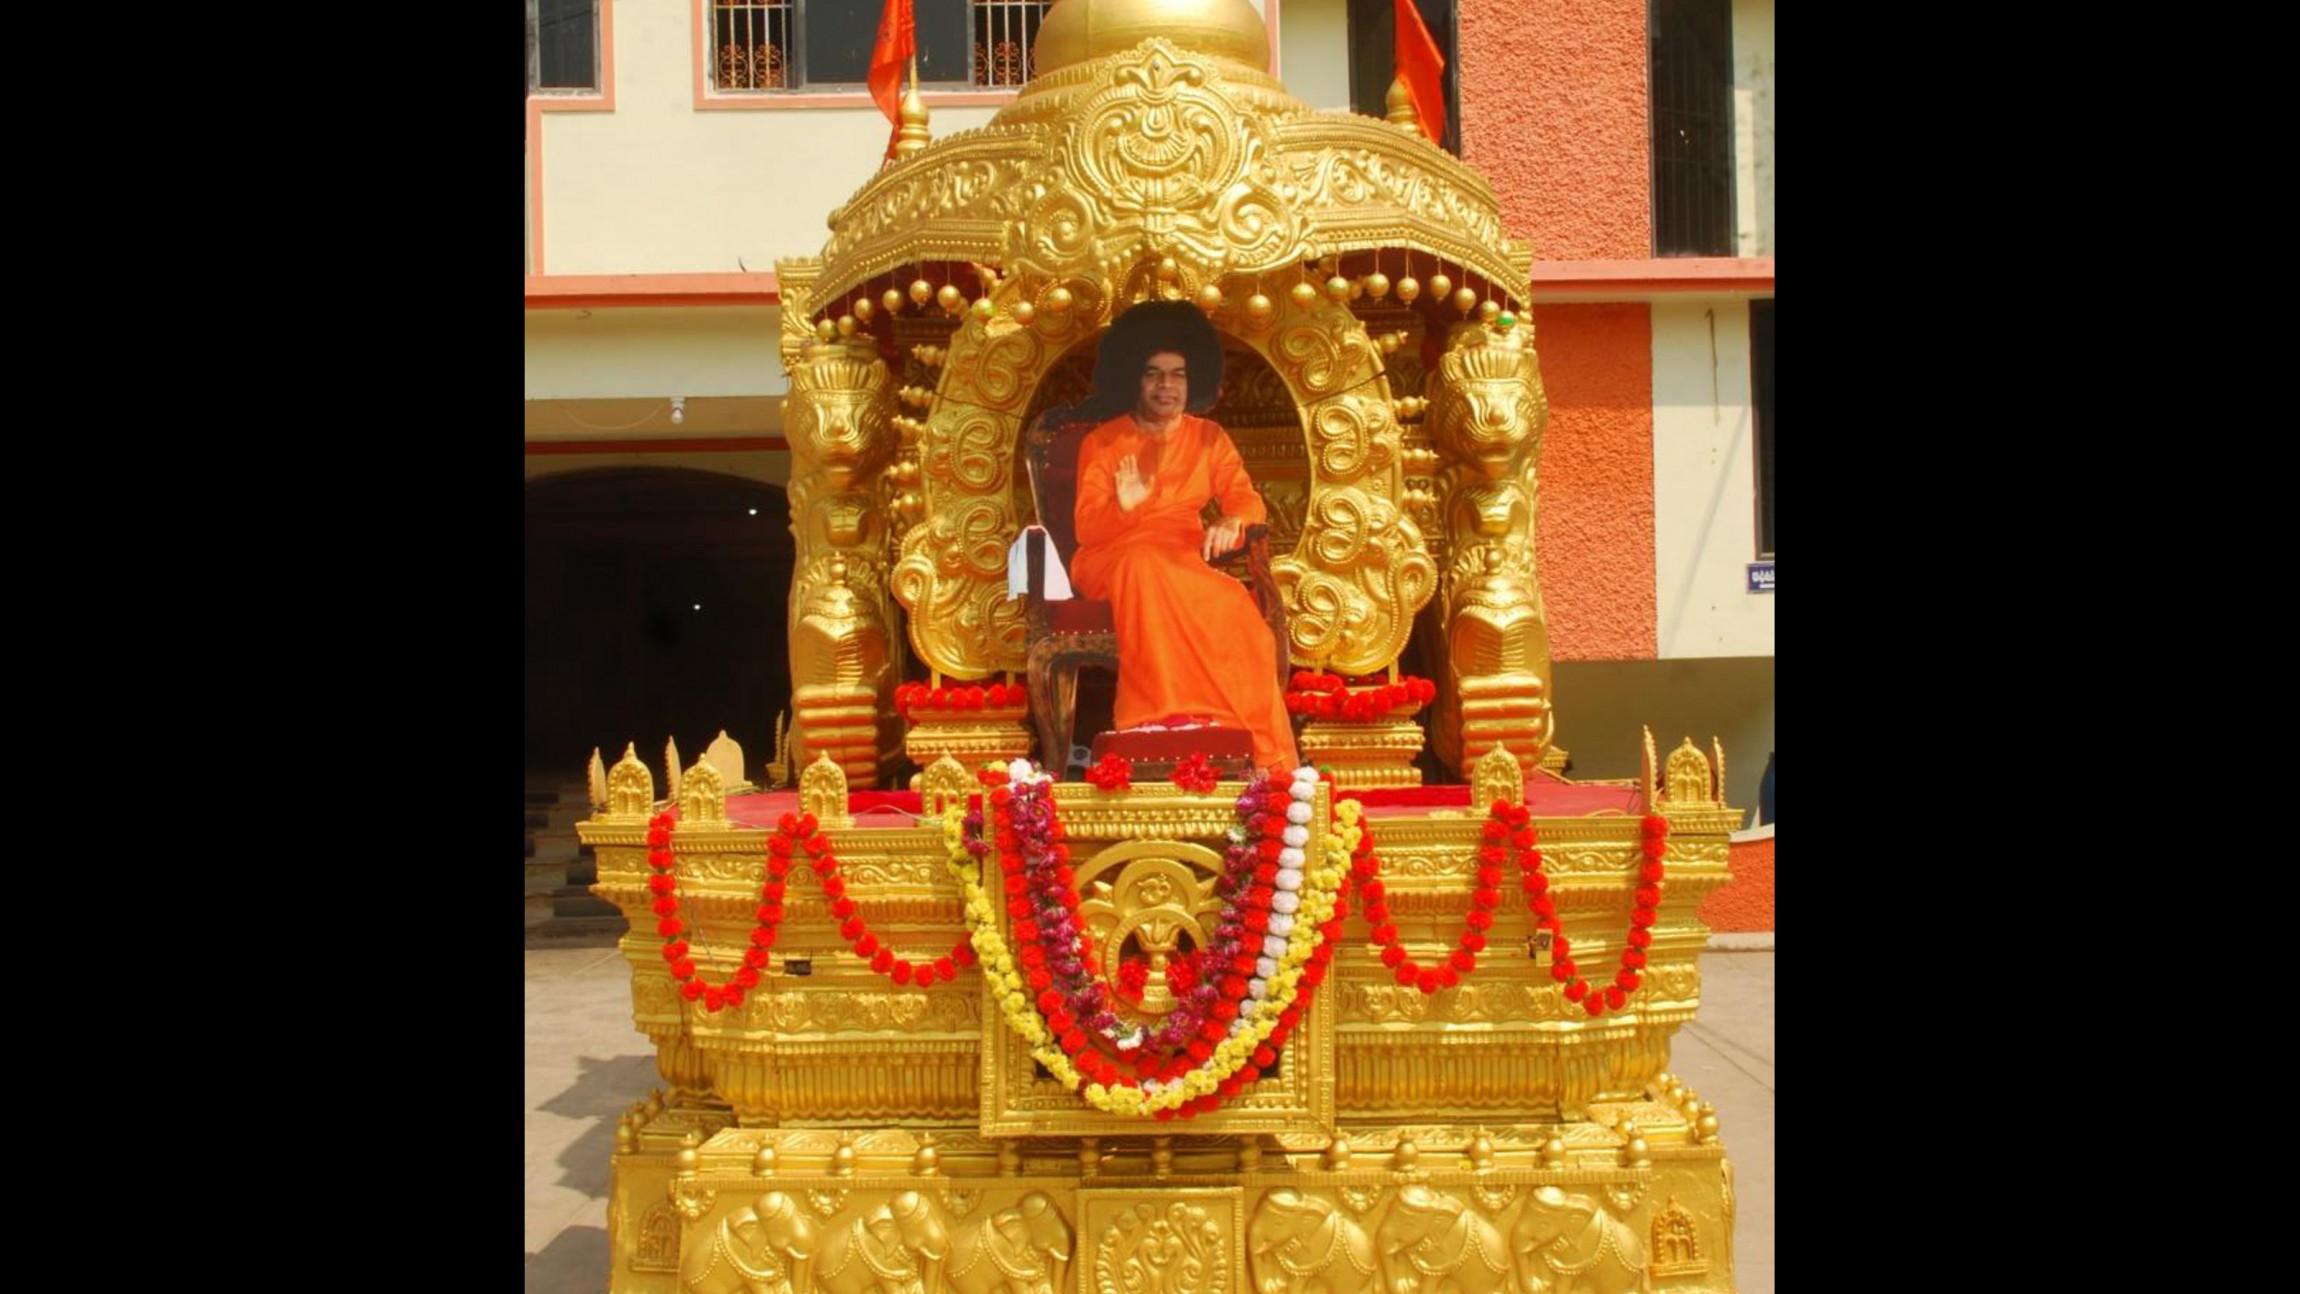 AMARAPURIYA ANANDA YATRA ~ GOLDEN JUBILEE CELEBRATIONS OF BHAGAWAN SRI SATHYA SAI BABA'S VISIT TO NORTH KANARA DISTRICT, SSSSO KARNATAKA